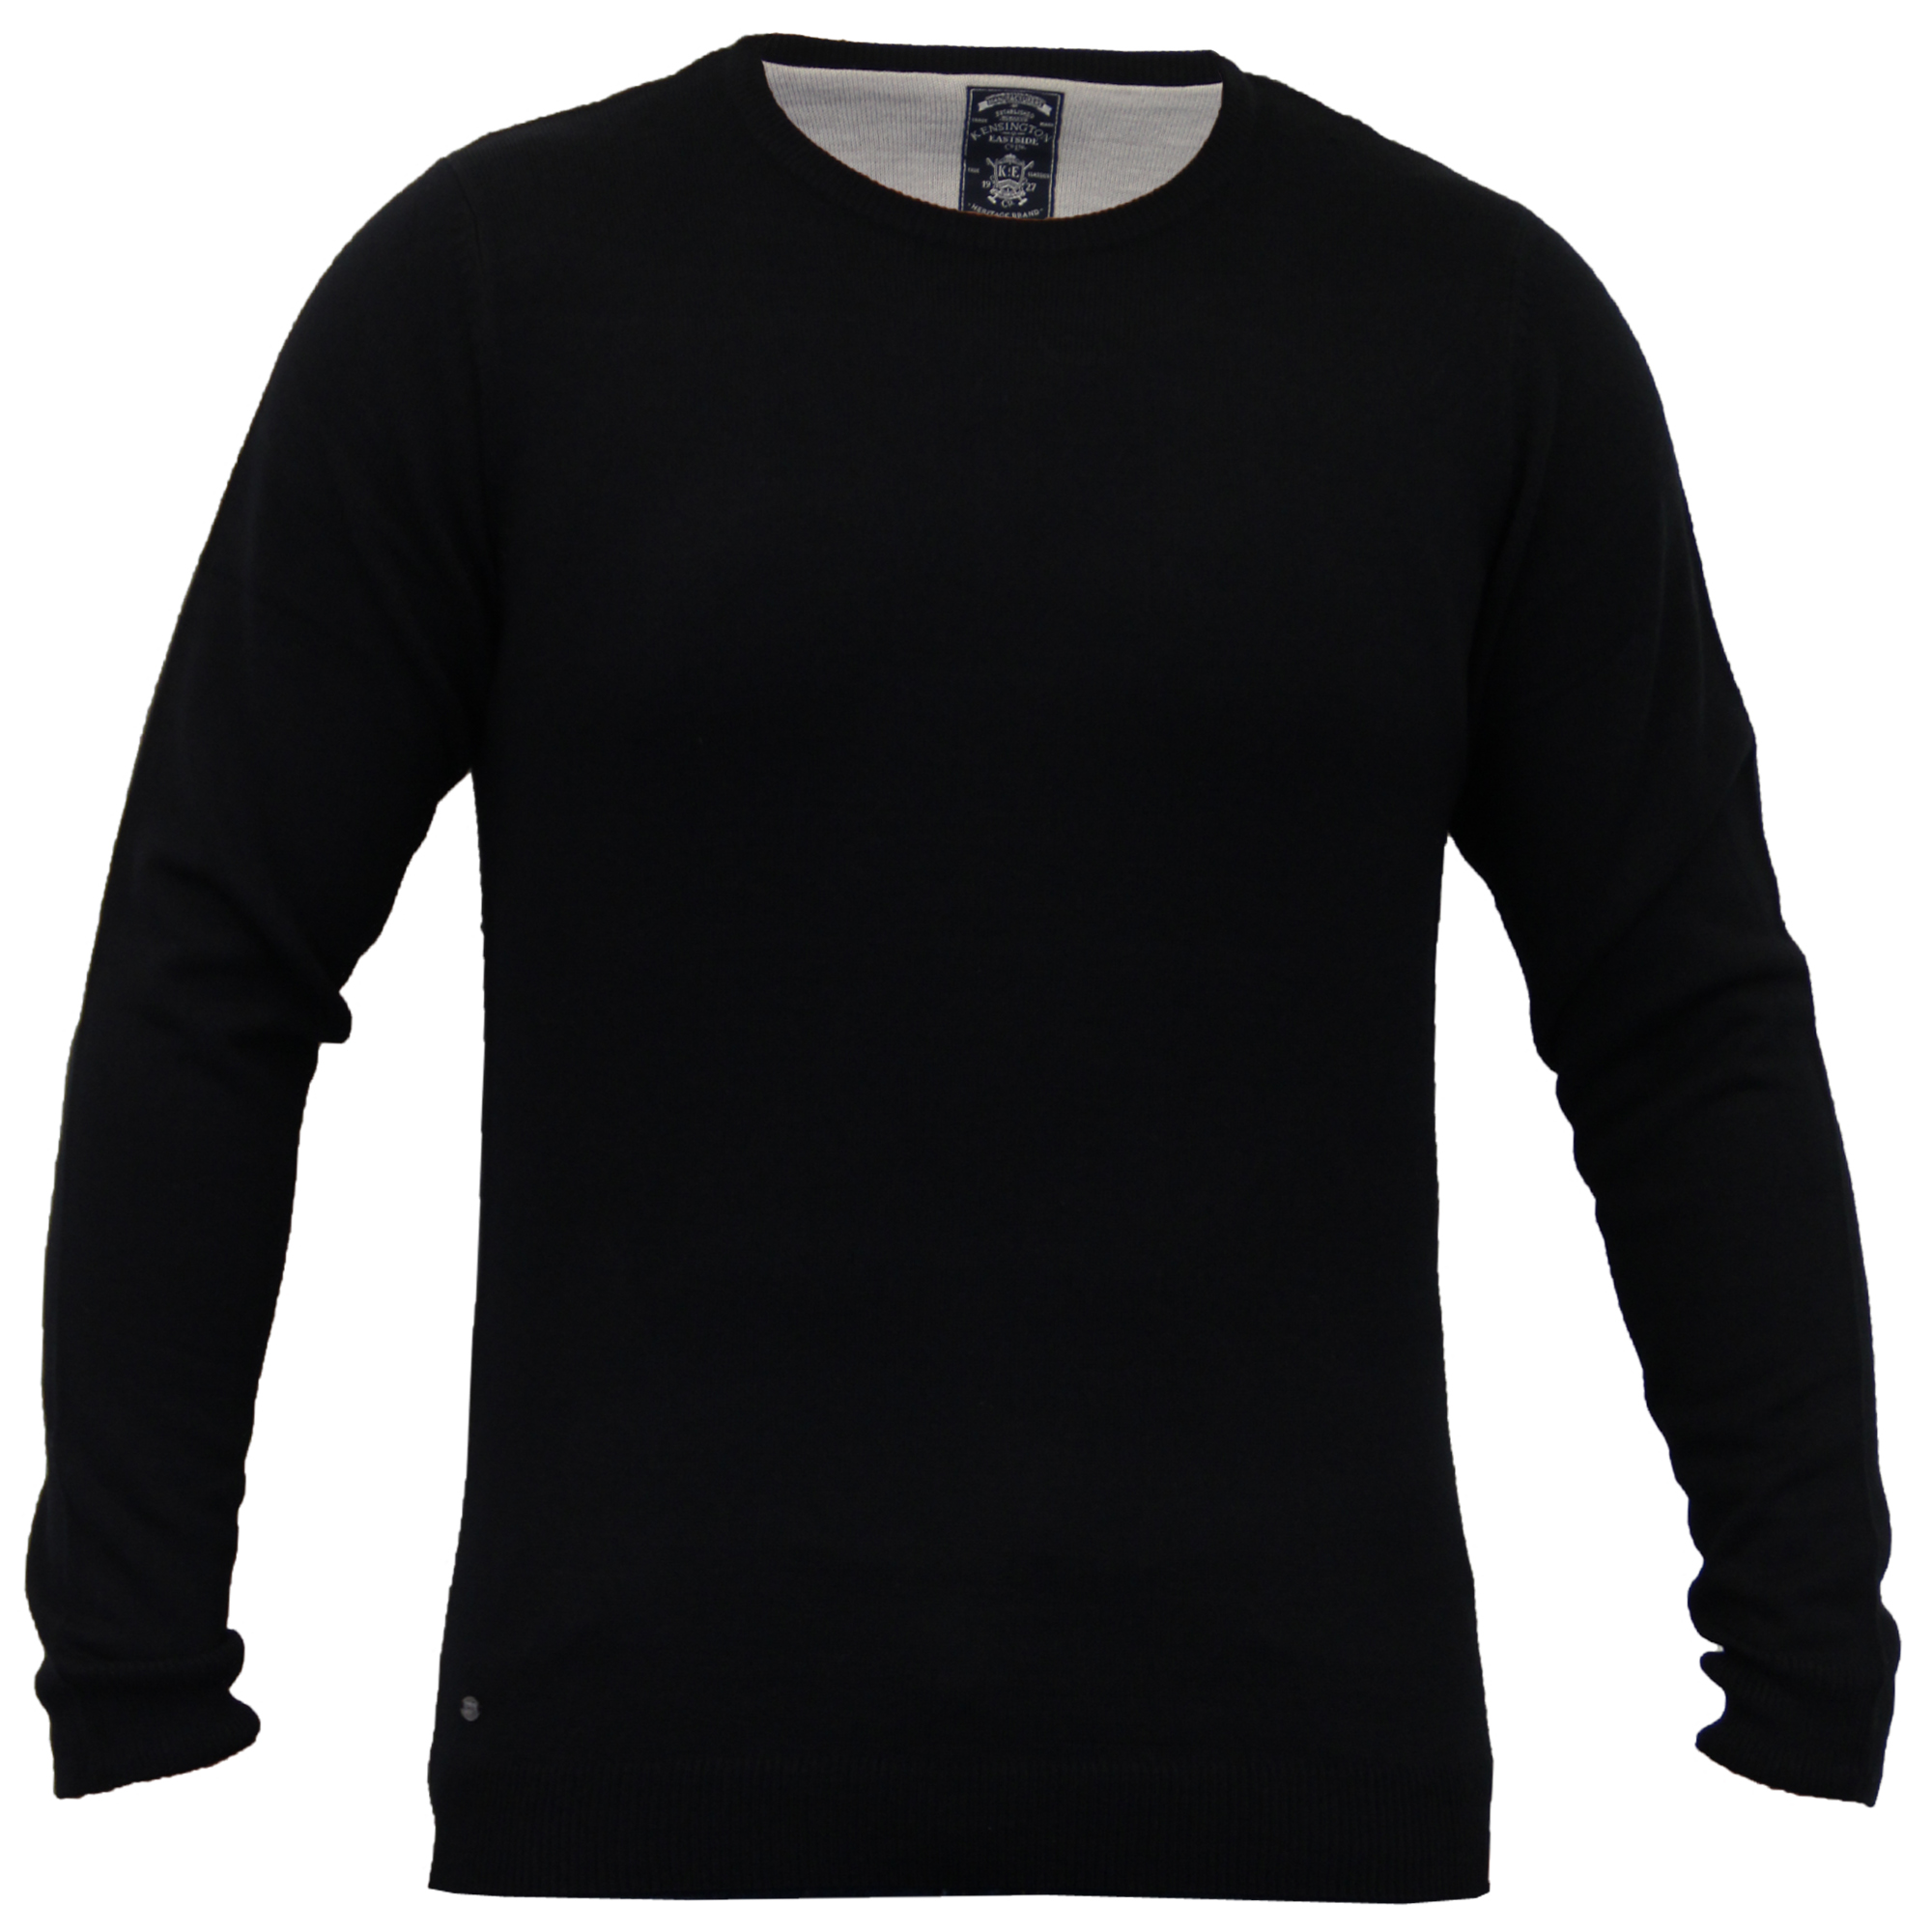 herren geschnittet acryl pullover top winter pullover by kensington eastside ebay. Black Bedroom Furniture Sets. Home Design Ideas